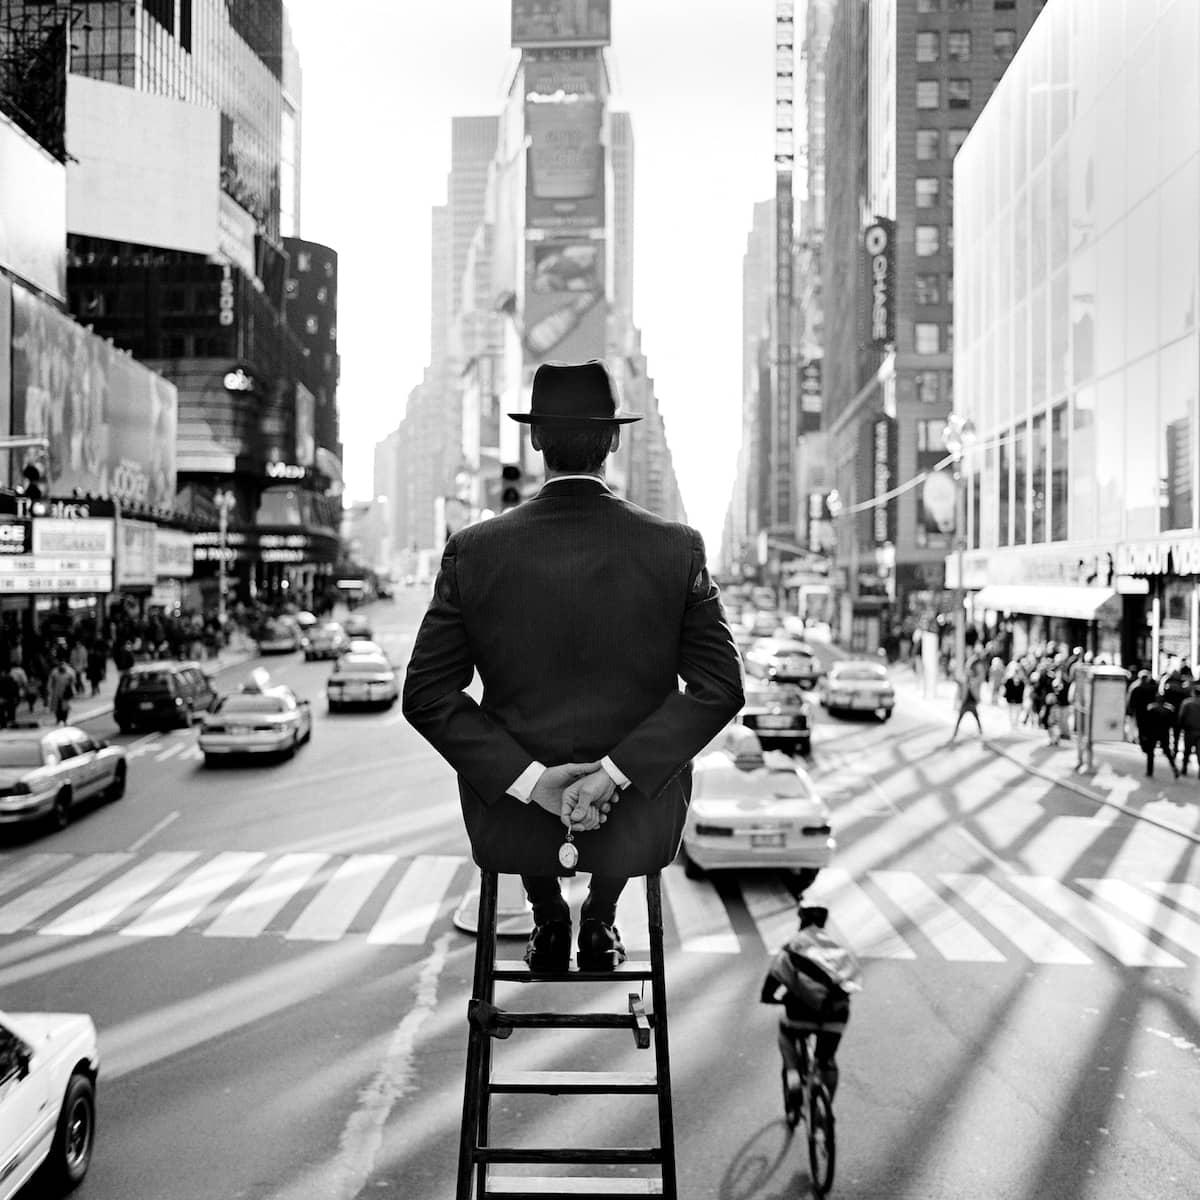 #286 Rodney Smith Photography - Whimsy & Light